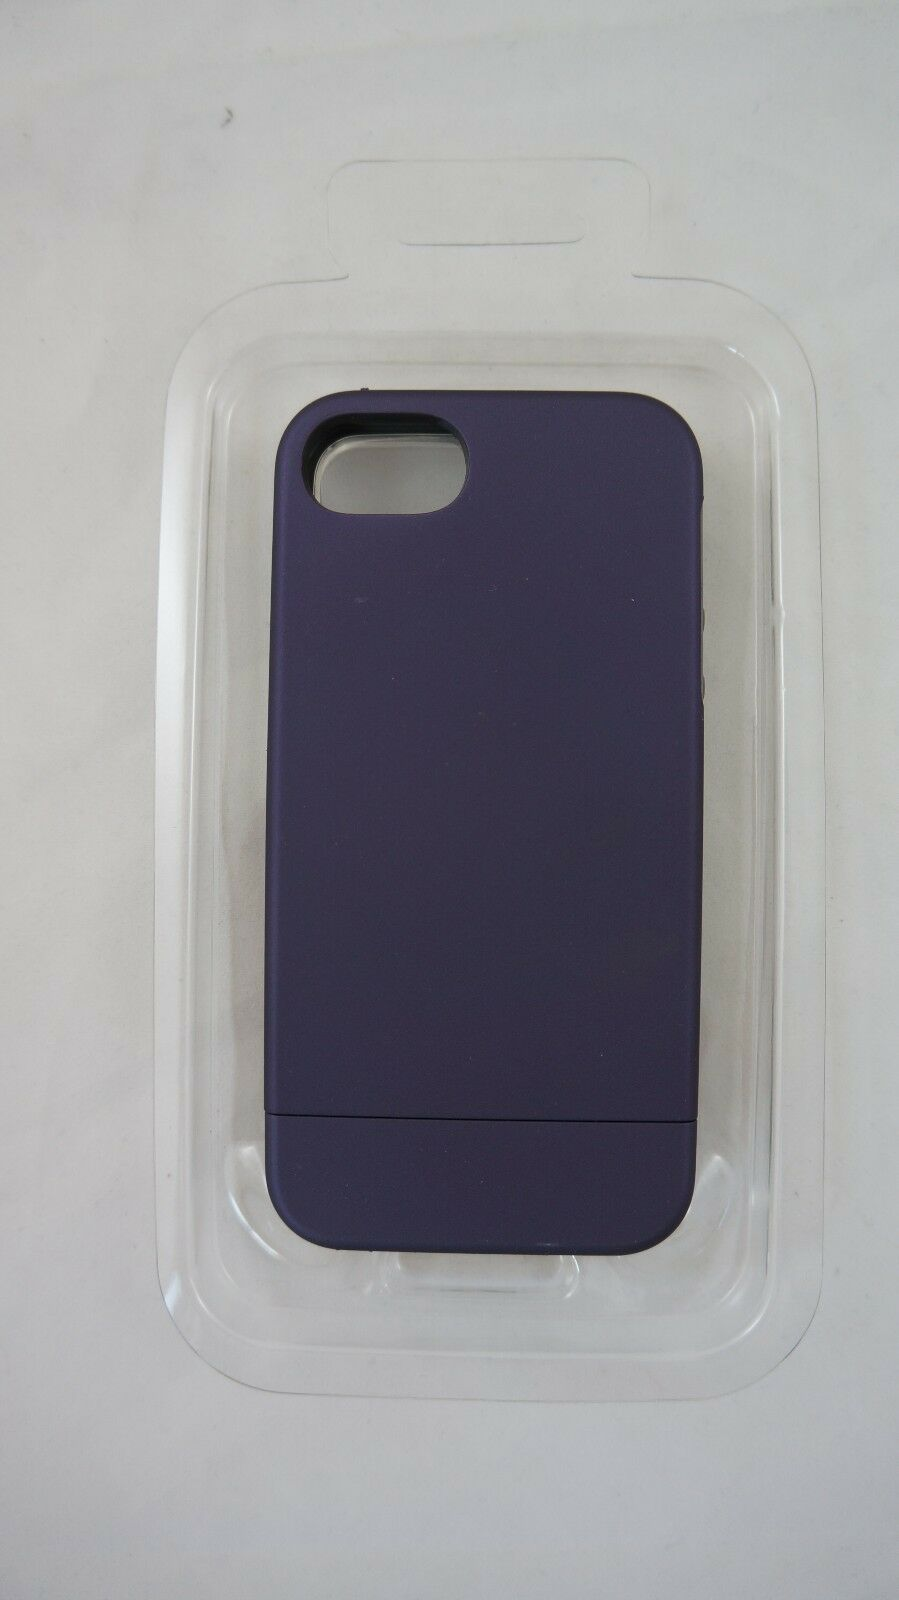 5b9e21534f6 Incase CL69158 Metallic Meta Slider Case for Apple iPhone 5 5s Mauve ...